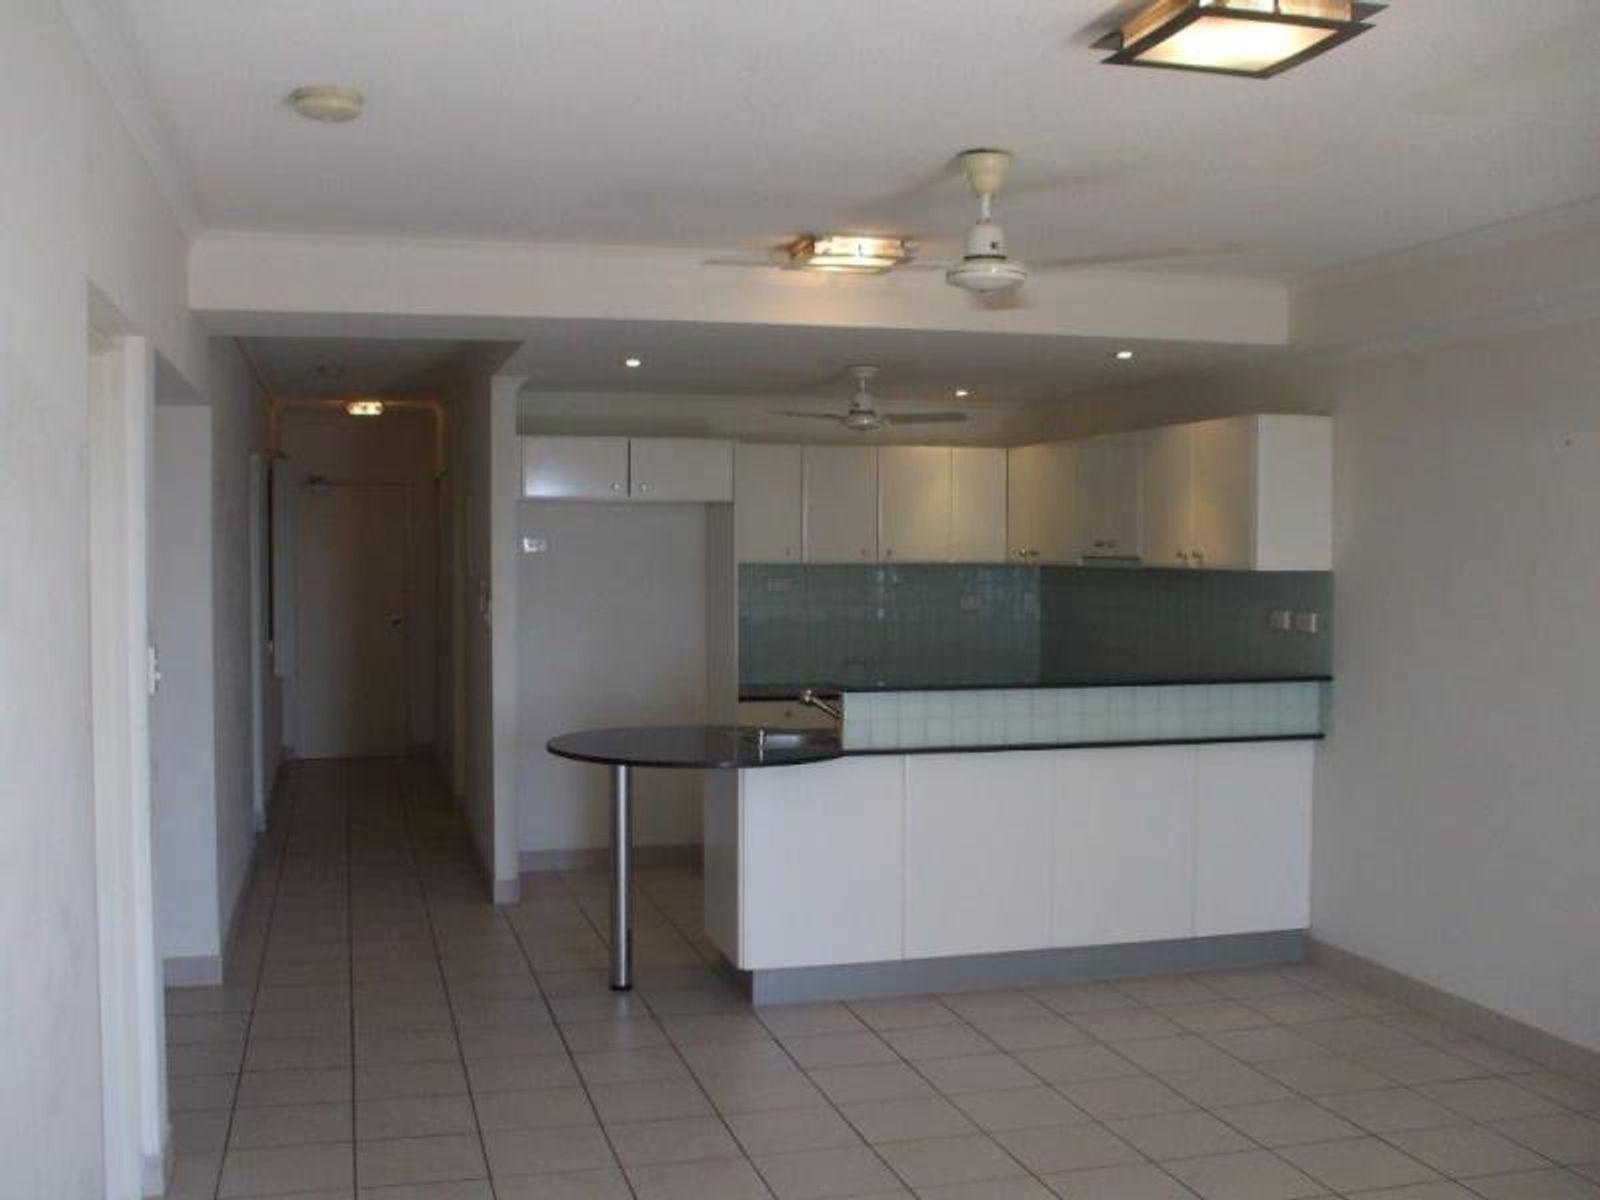 52/5 Cardona Court, Darwin City, NT 0800